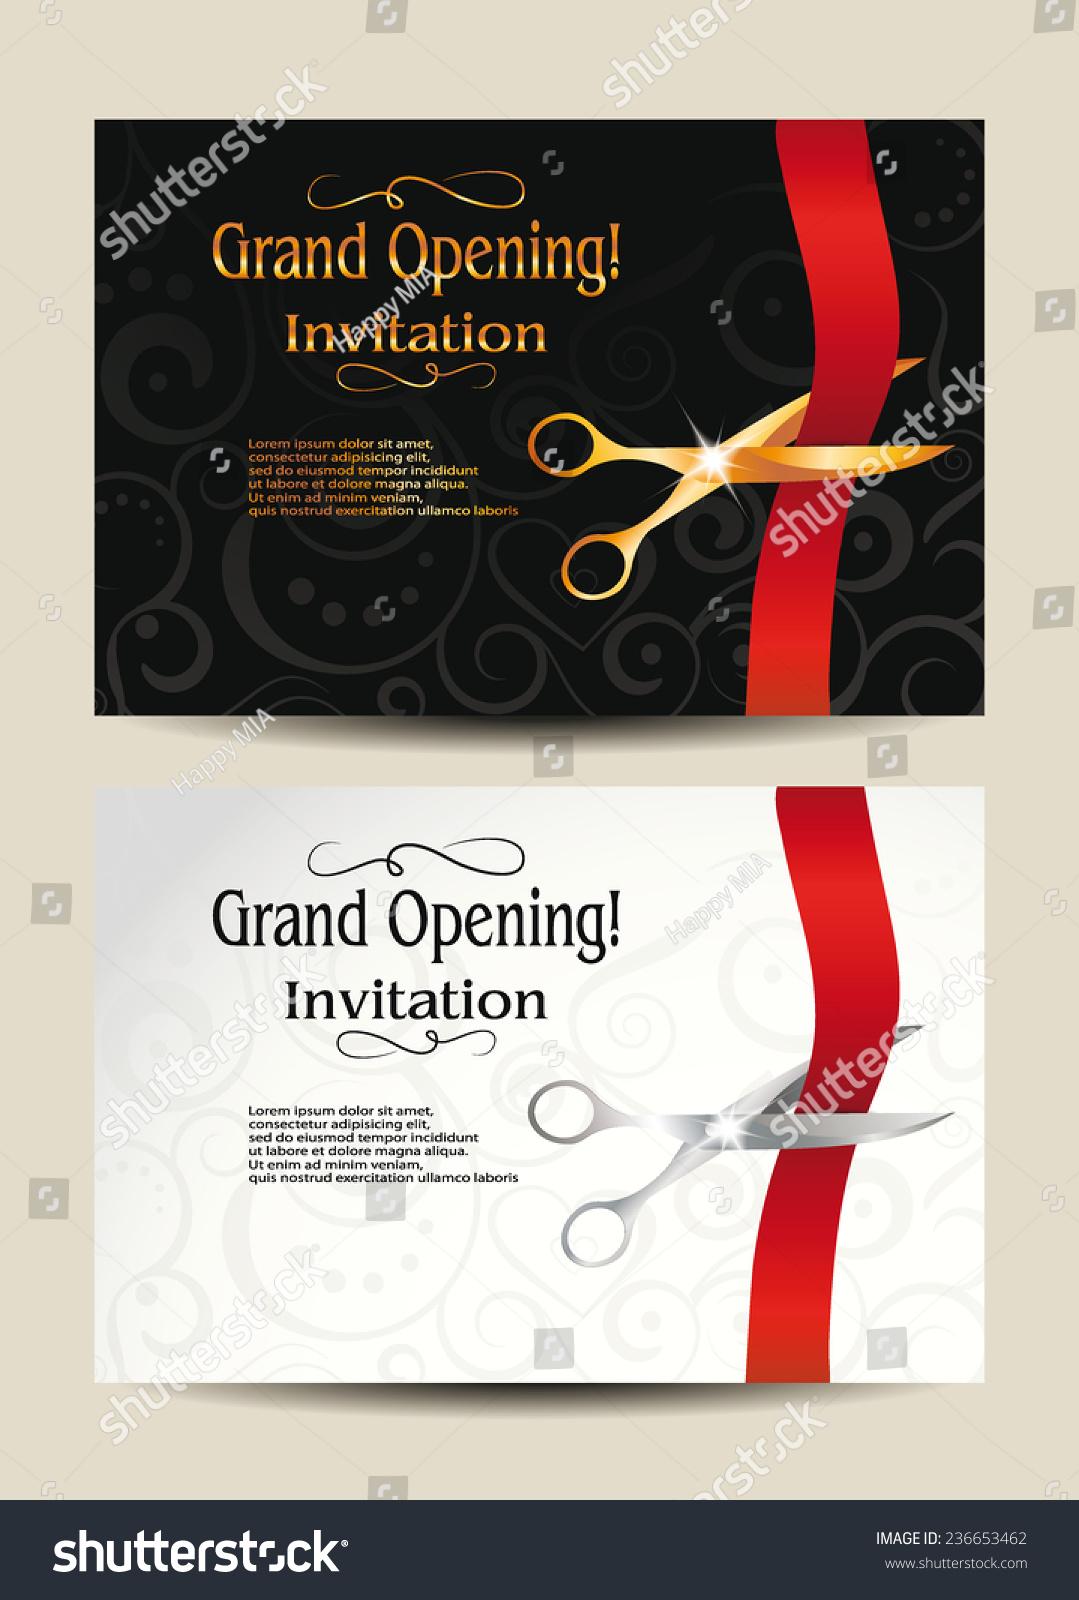 Grand Opening Invitation Template Free - Amazing Invitation Template Design by Billy Berks